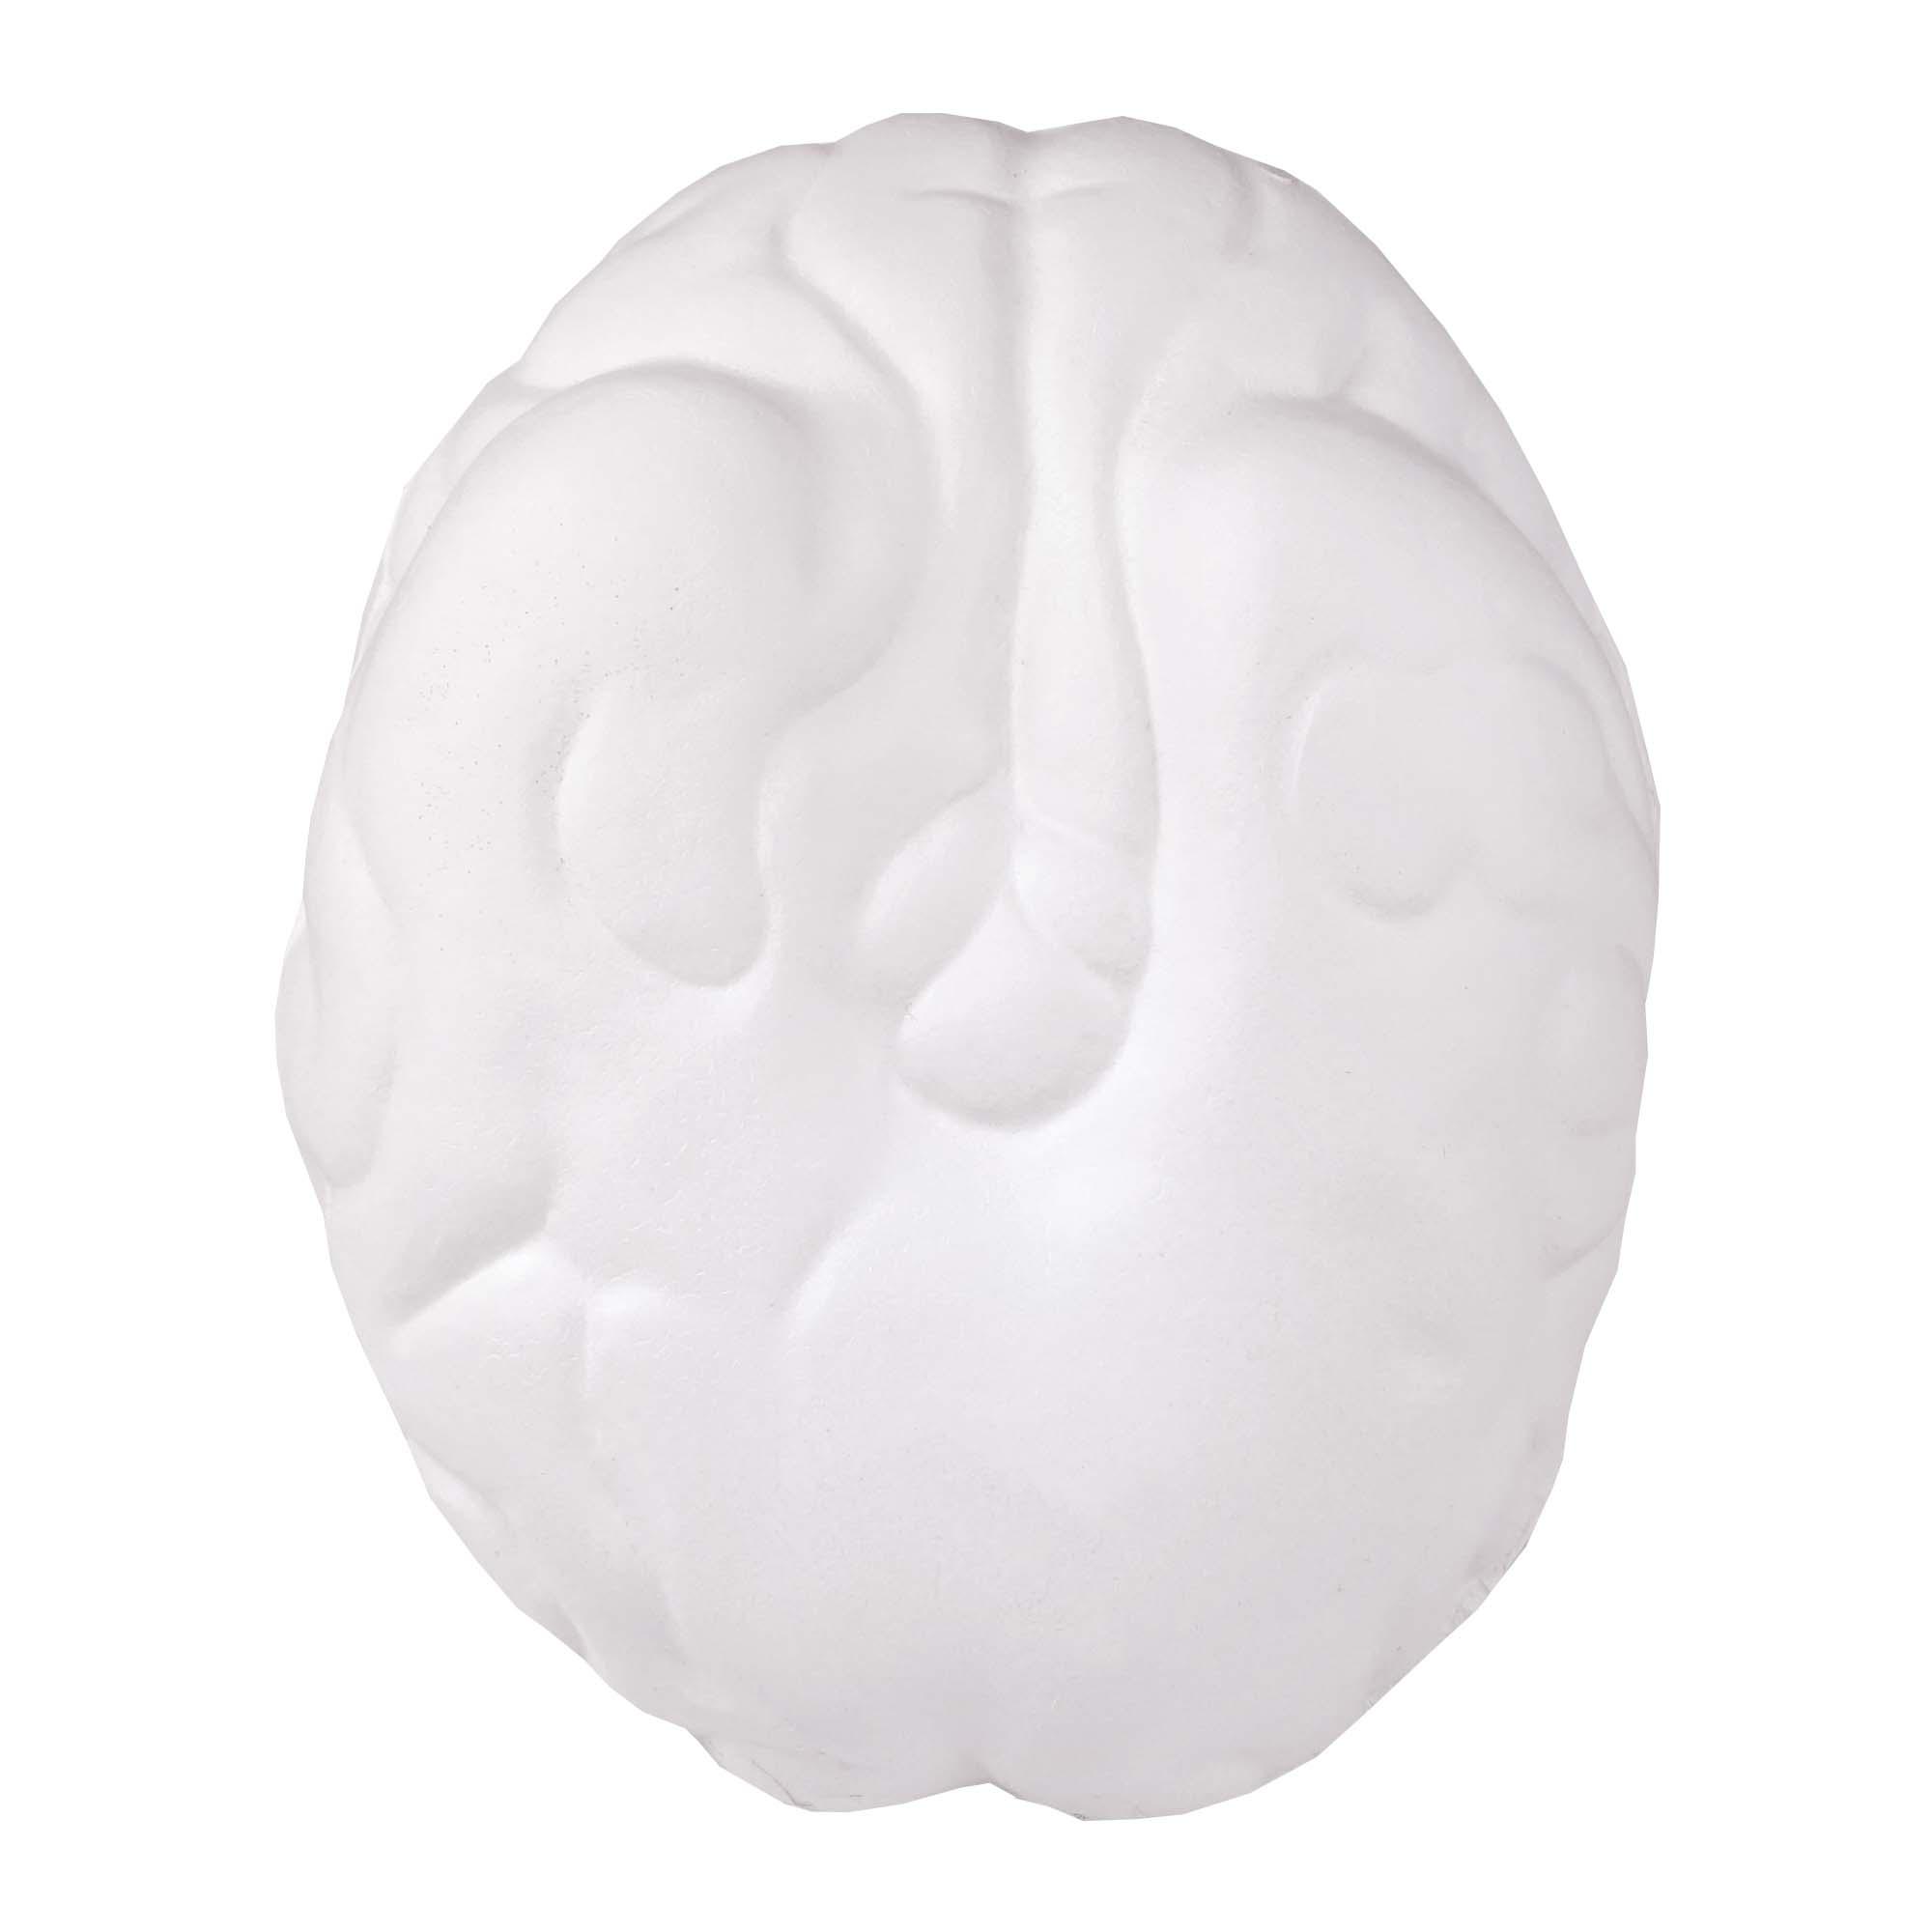 Branded Stress Brain